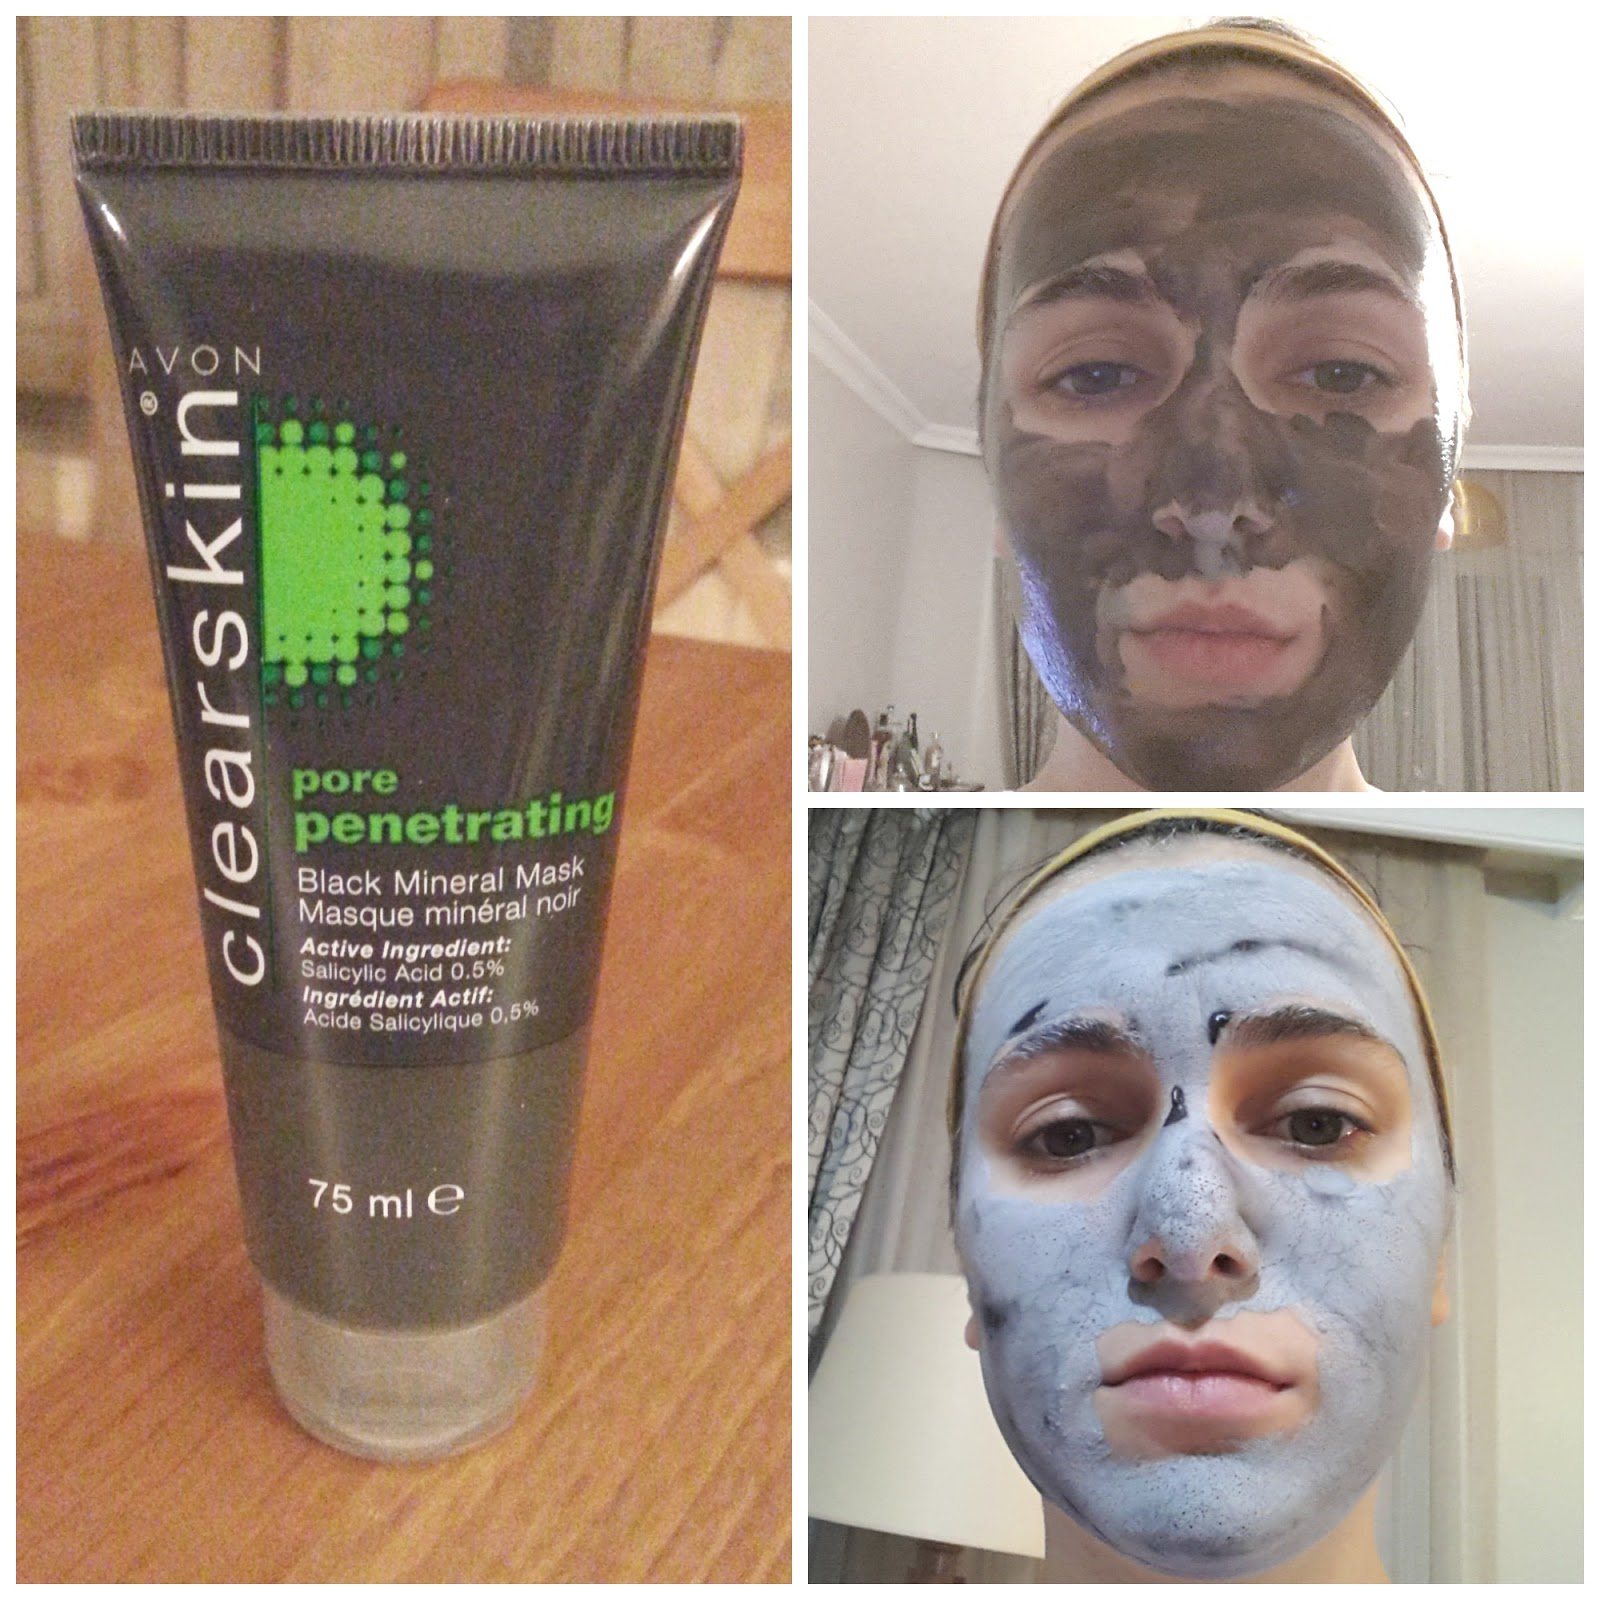 Avon Pore Penetrating Black Mineral Mask